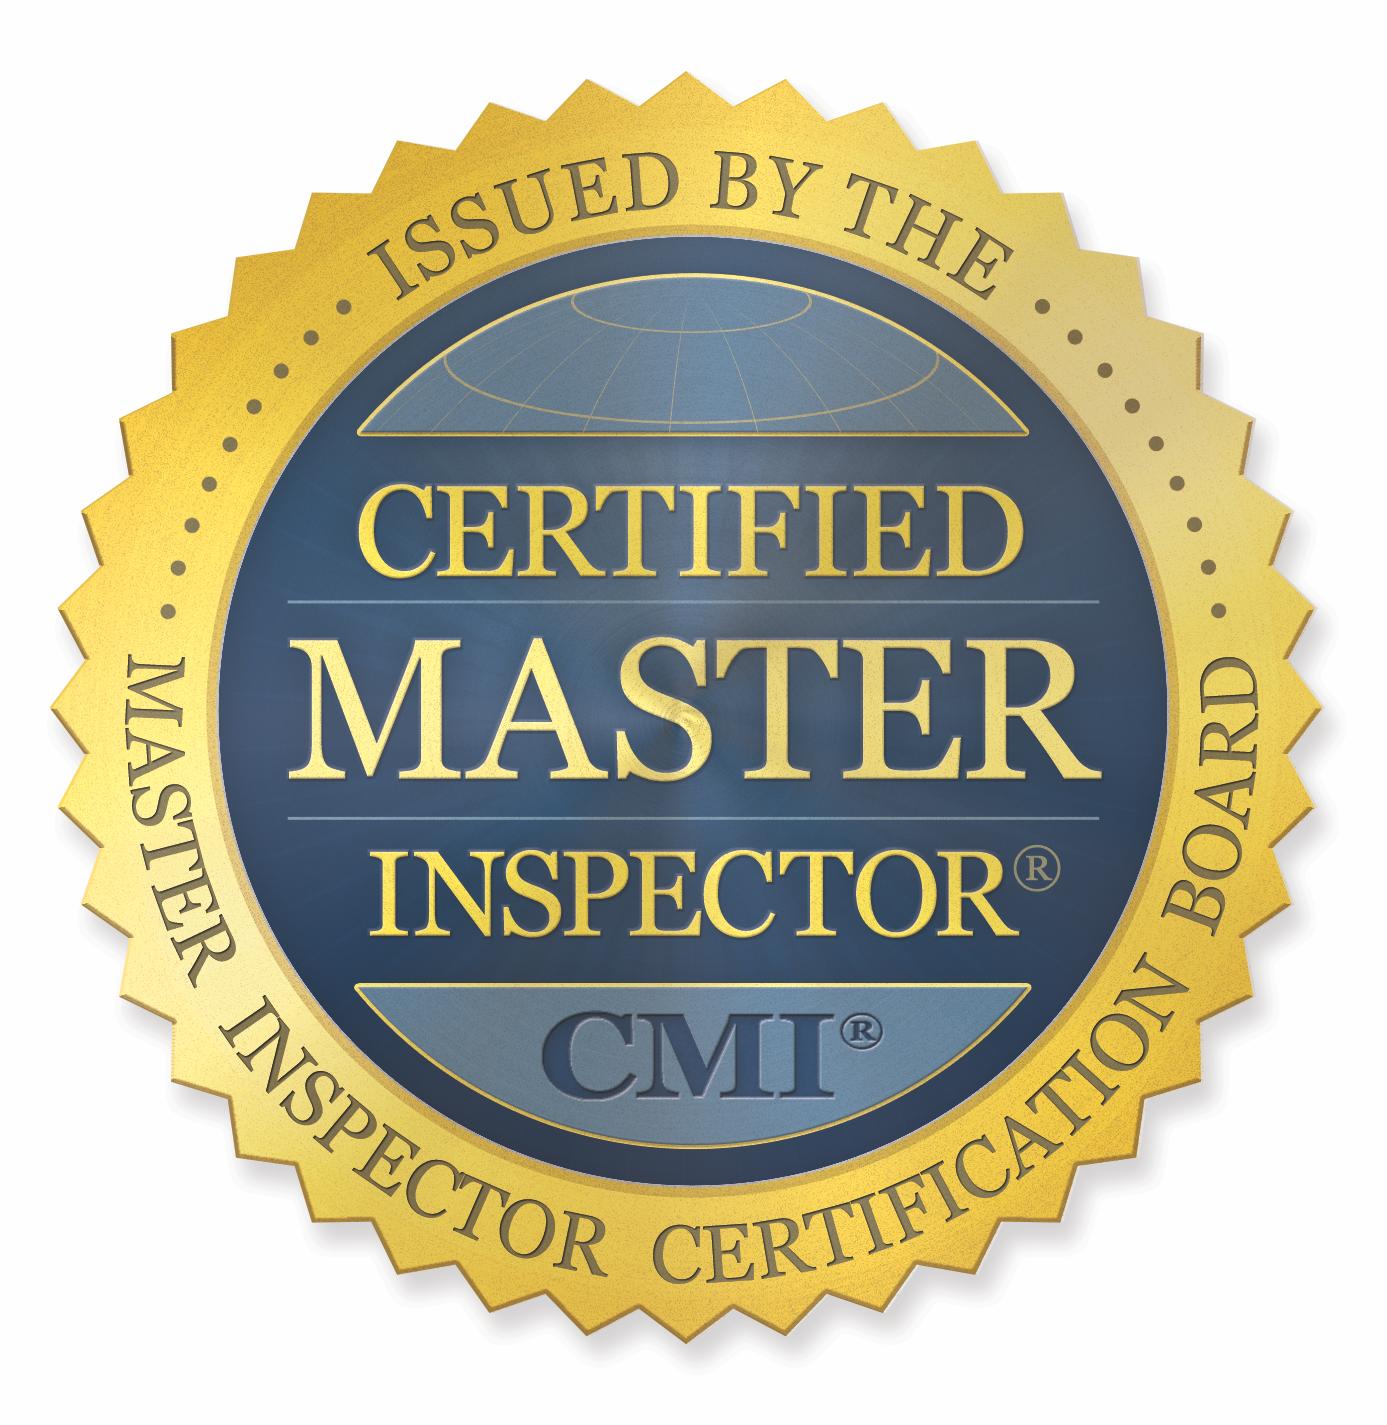 CMI badge